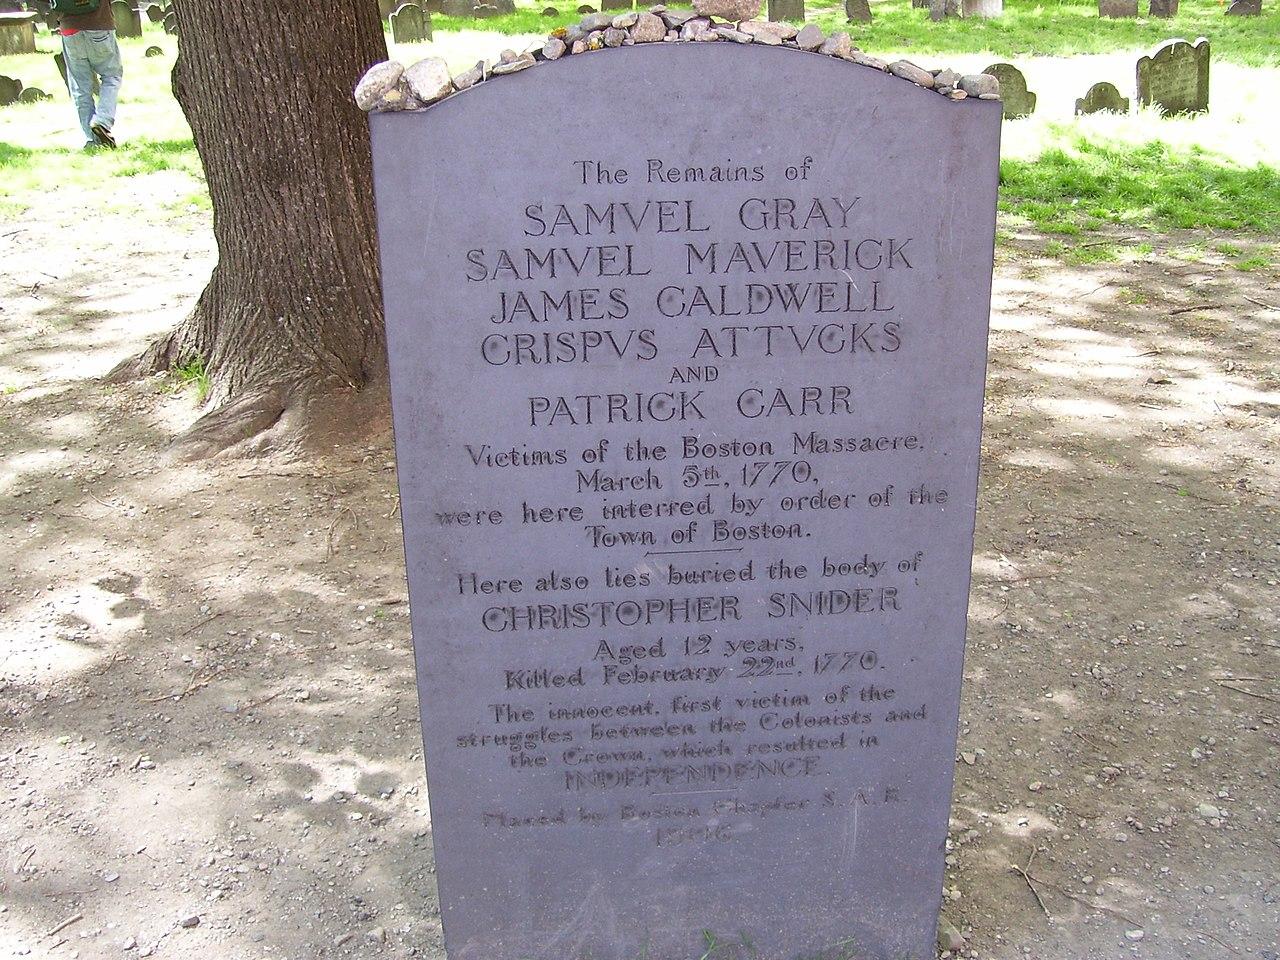 http://upload.wikimedia.org/wikipedia/commons/thumb/c/c9/Boston_Massacre_victims_grave.jpg/1280px-Boston_Massacre_victims_grave.jpg